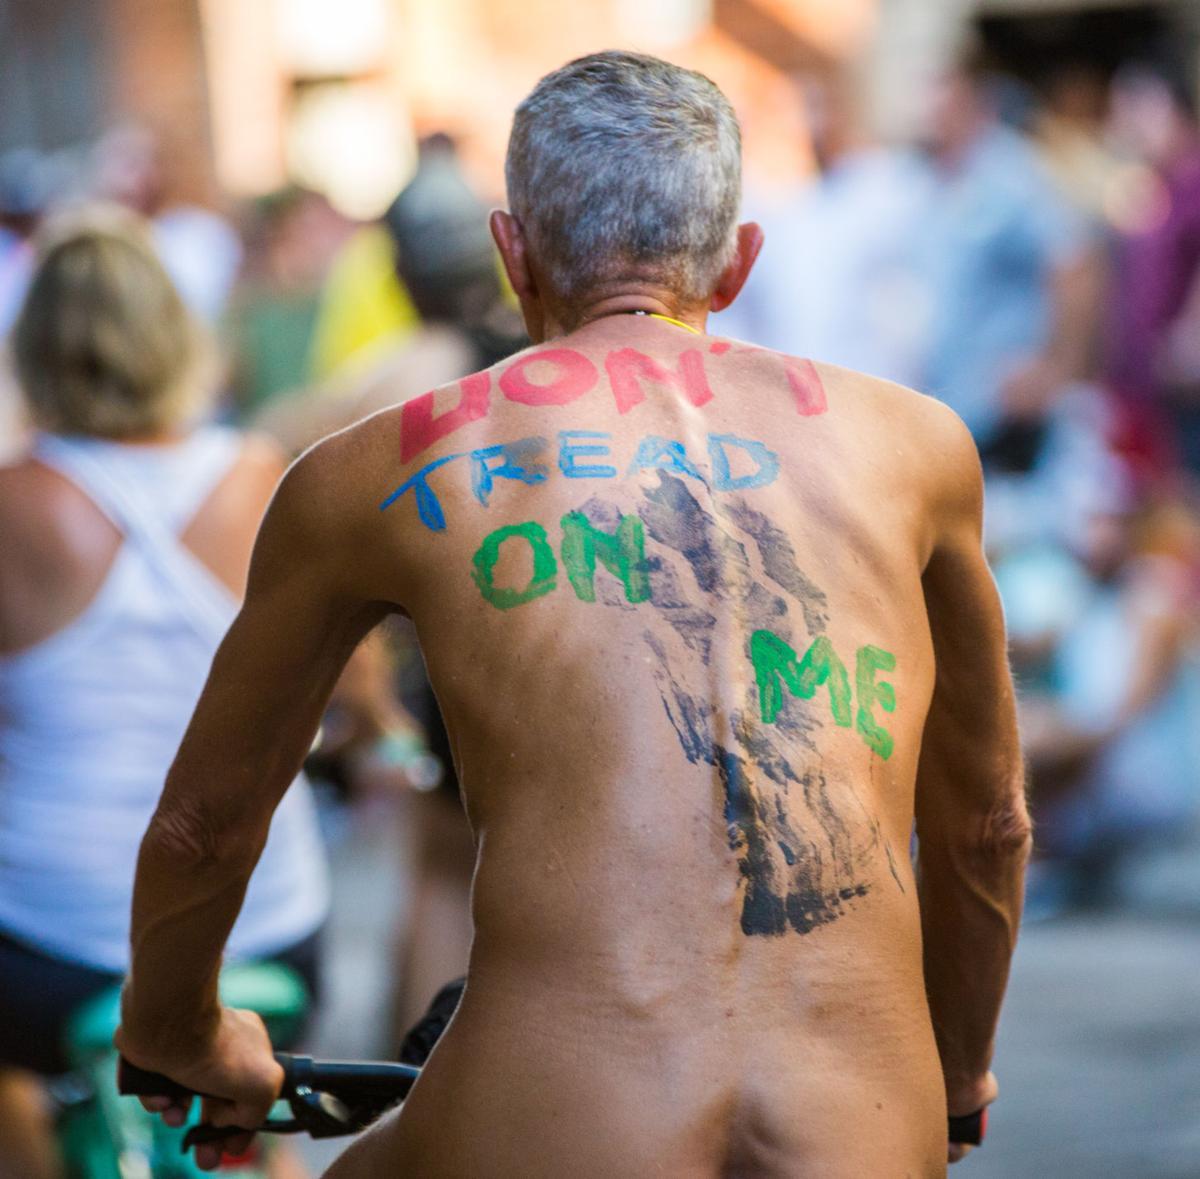 NO.nakedbikes.061018.016